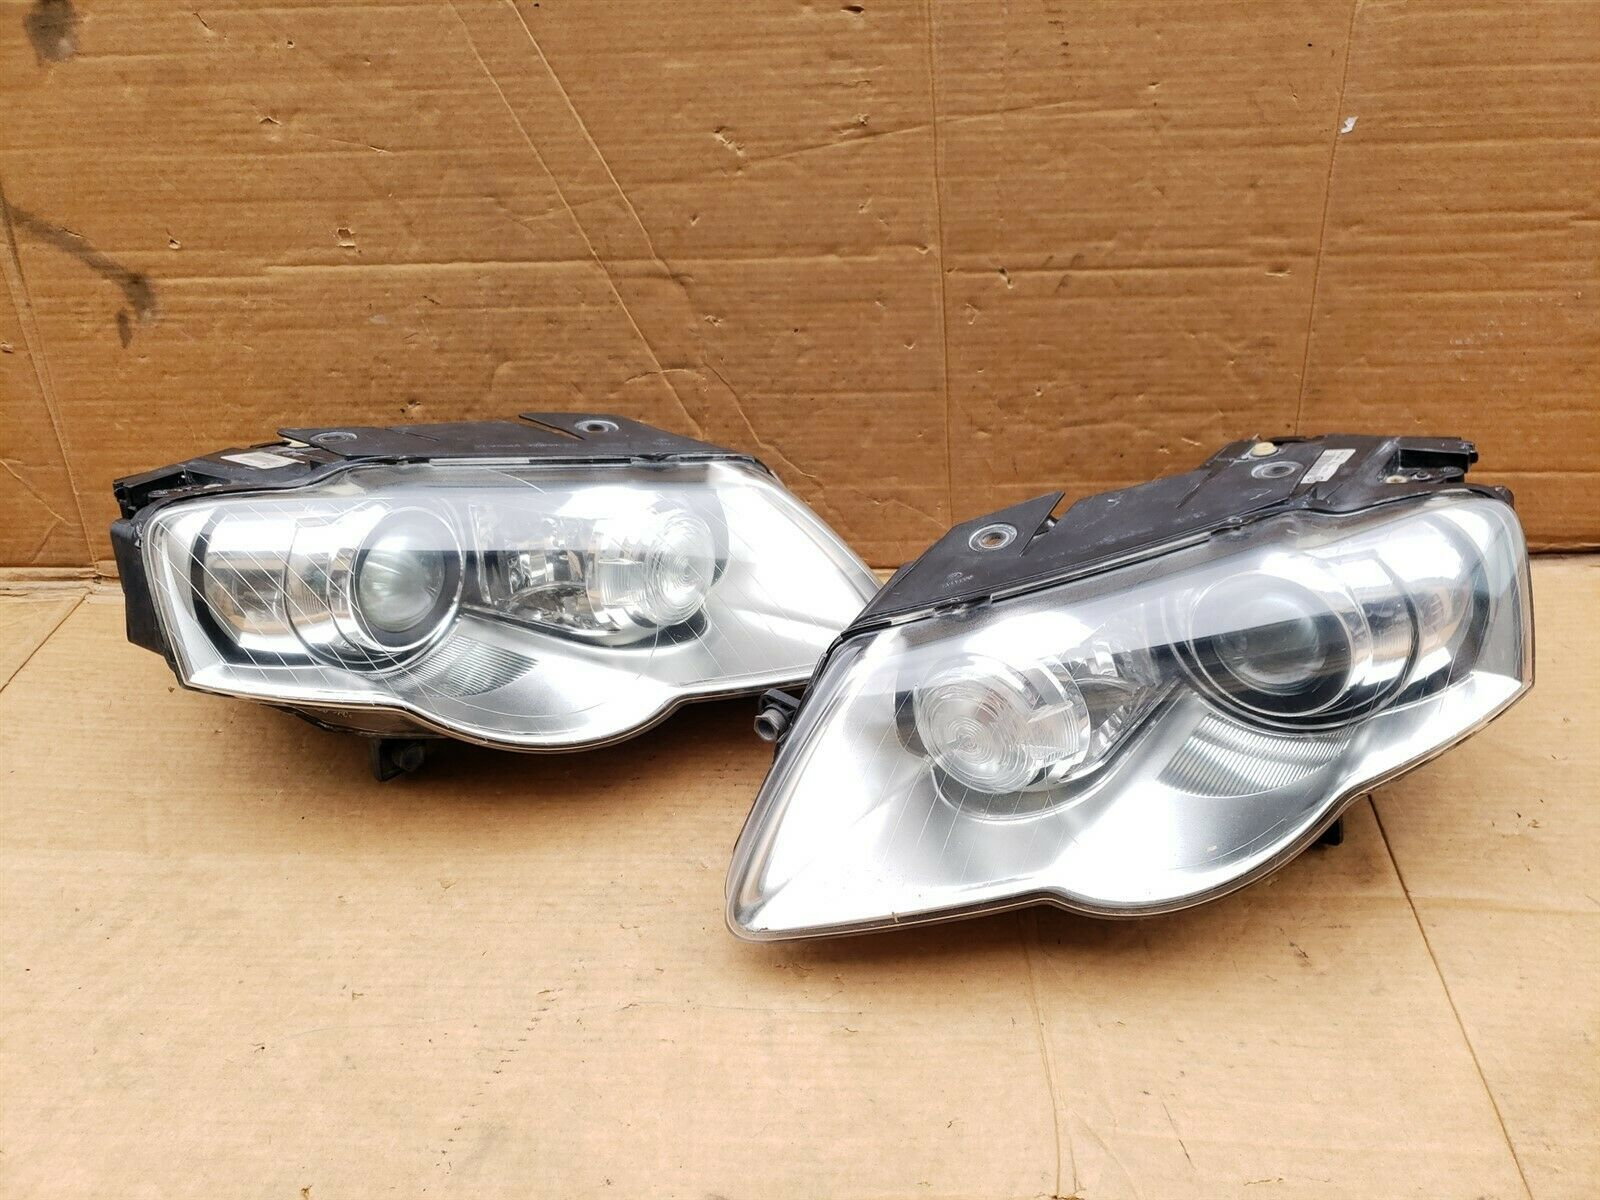 06-10 Volkswagen Passat Afs HID Xenon Headlight Head Lights Lamps Set L&R